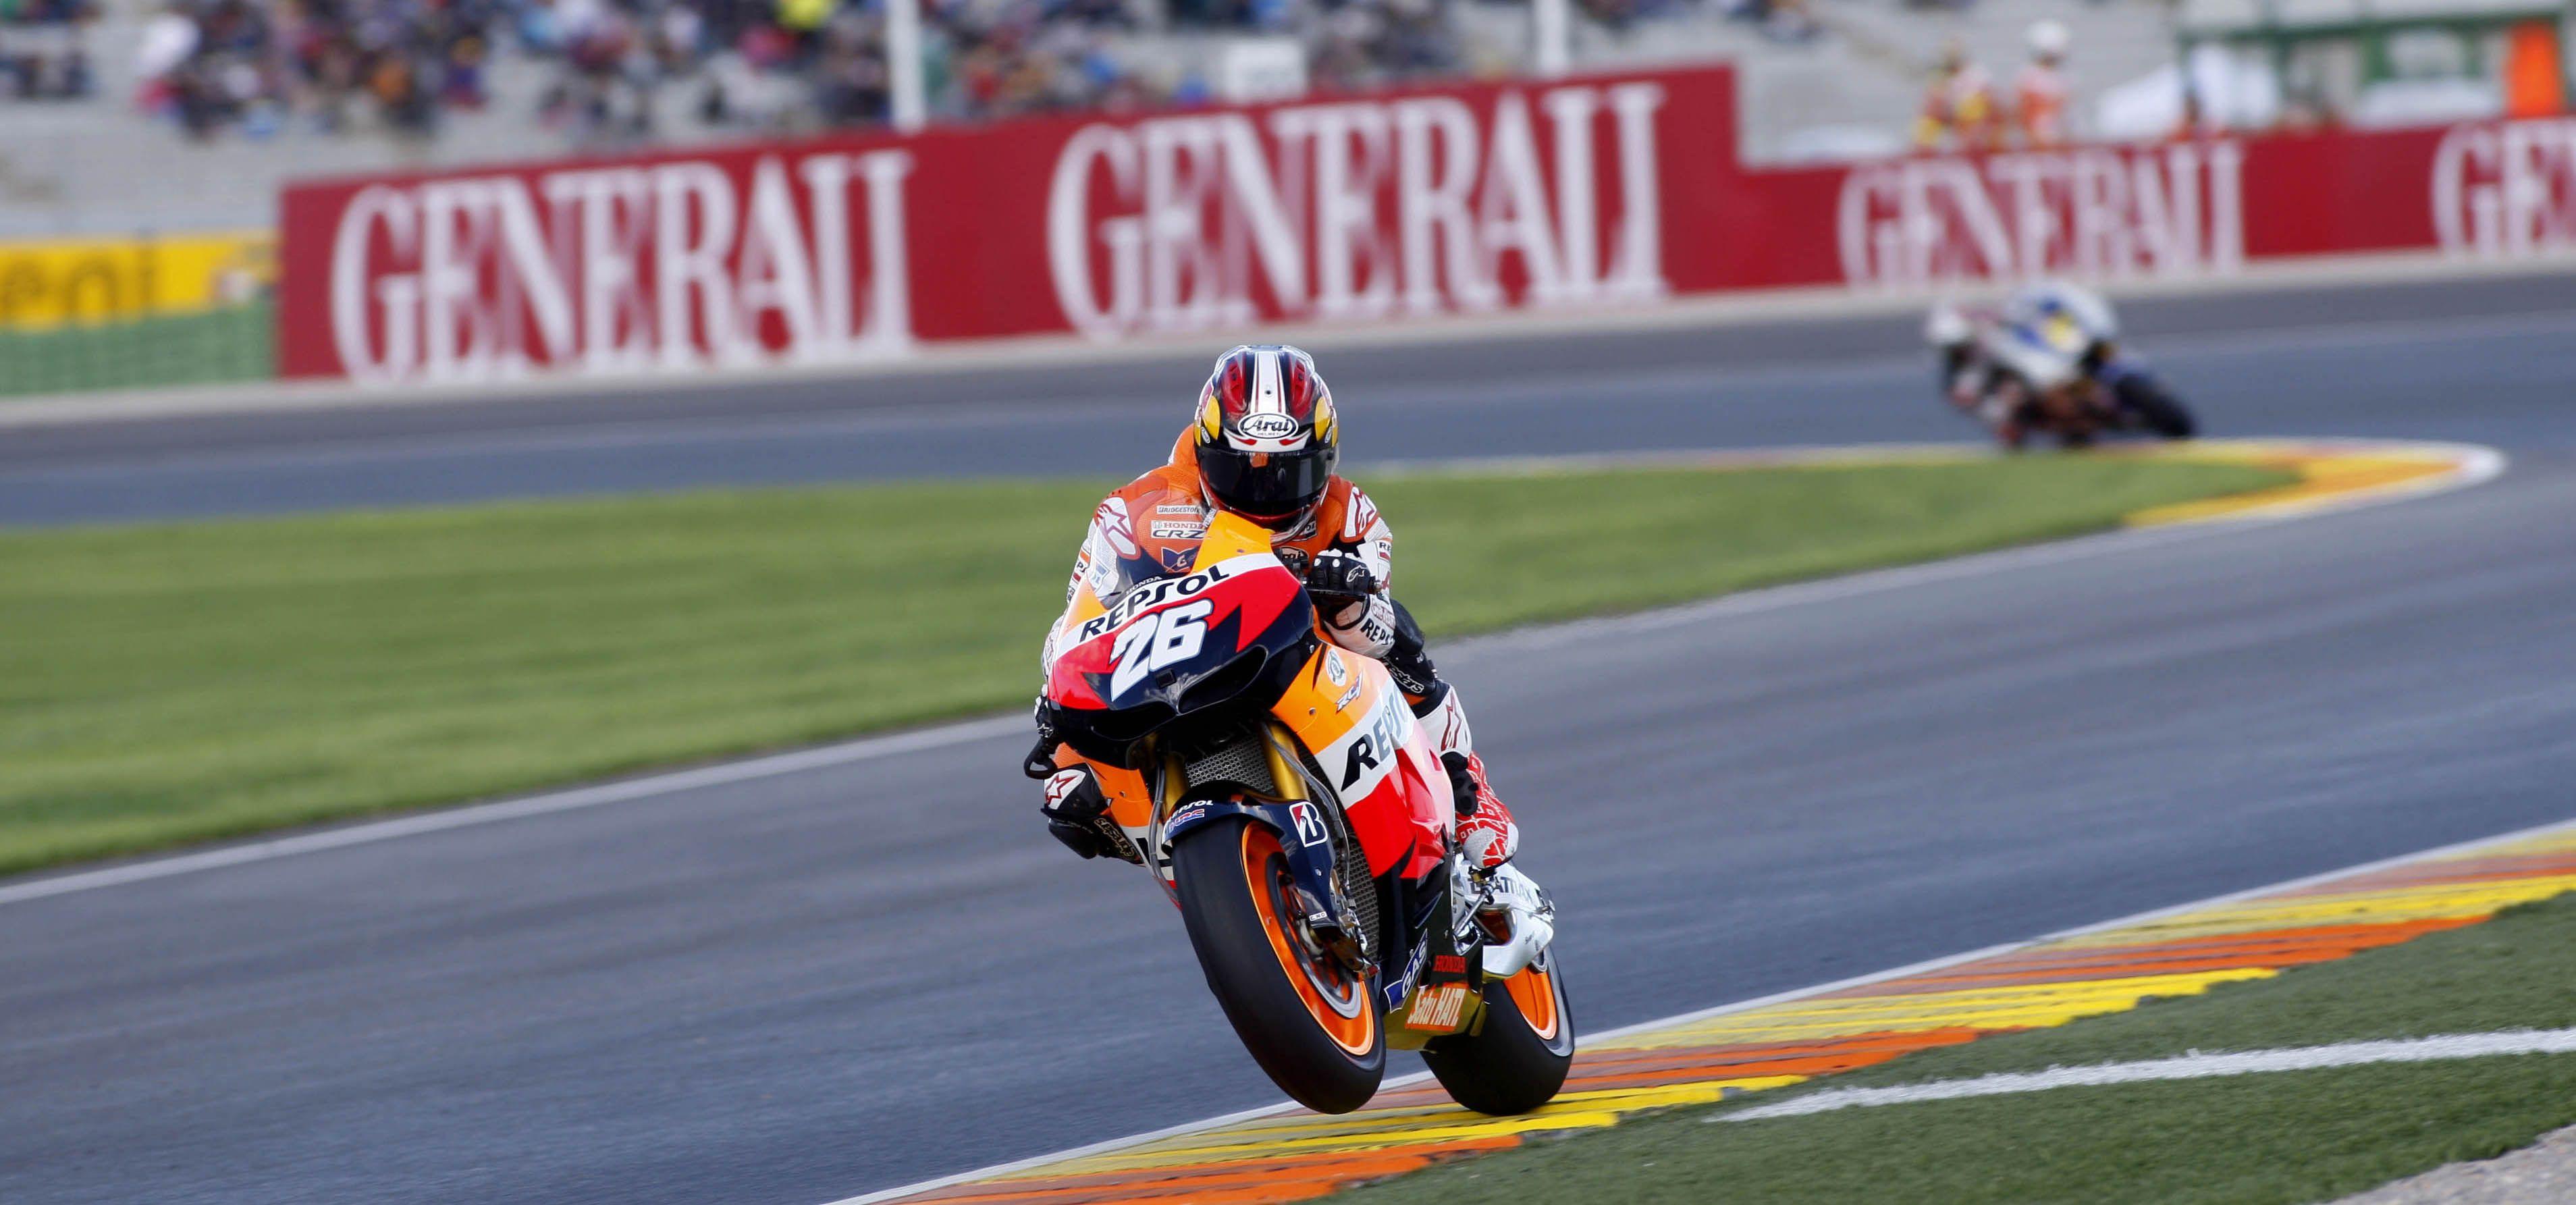 Watch MotoGP Valencia Live Stream Online Motogp valencia